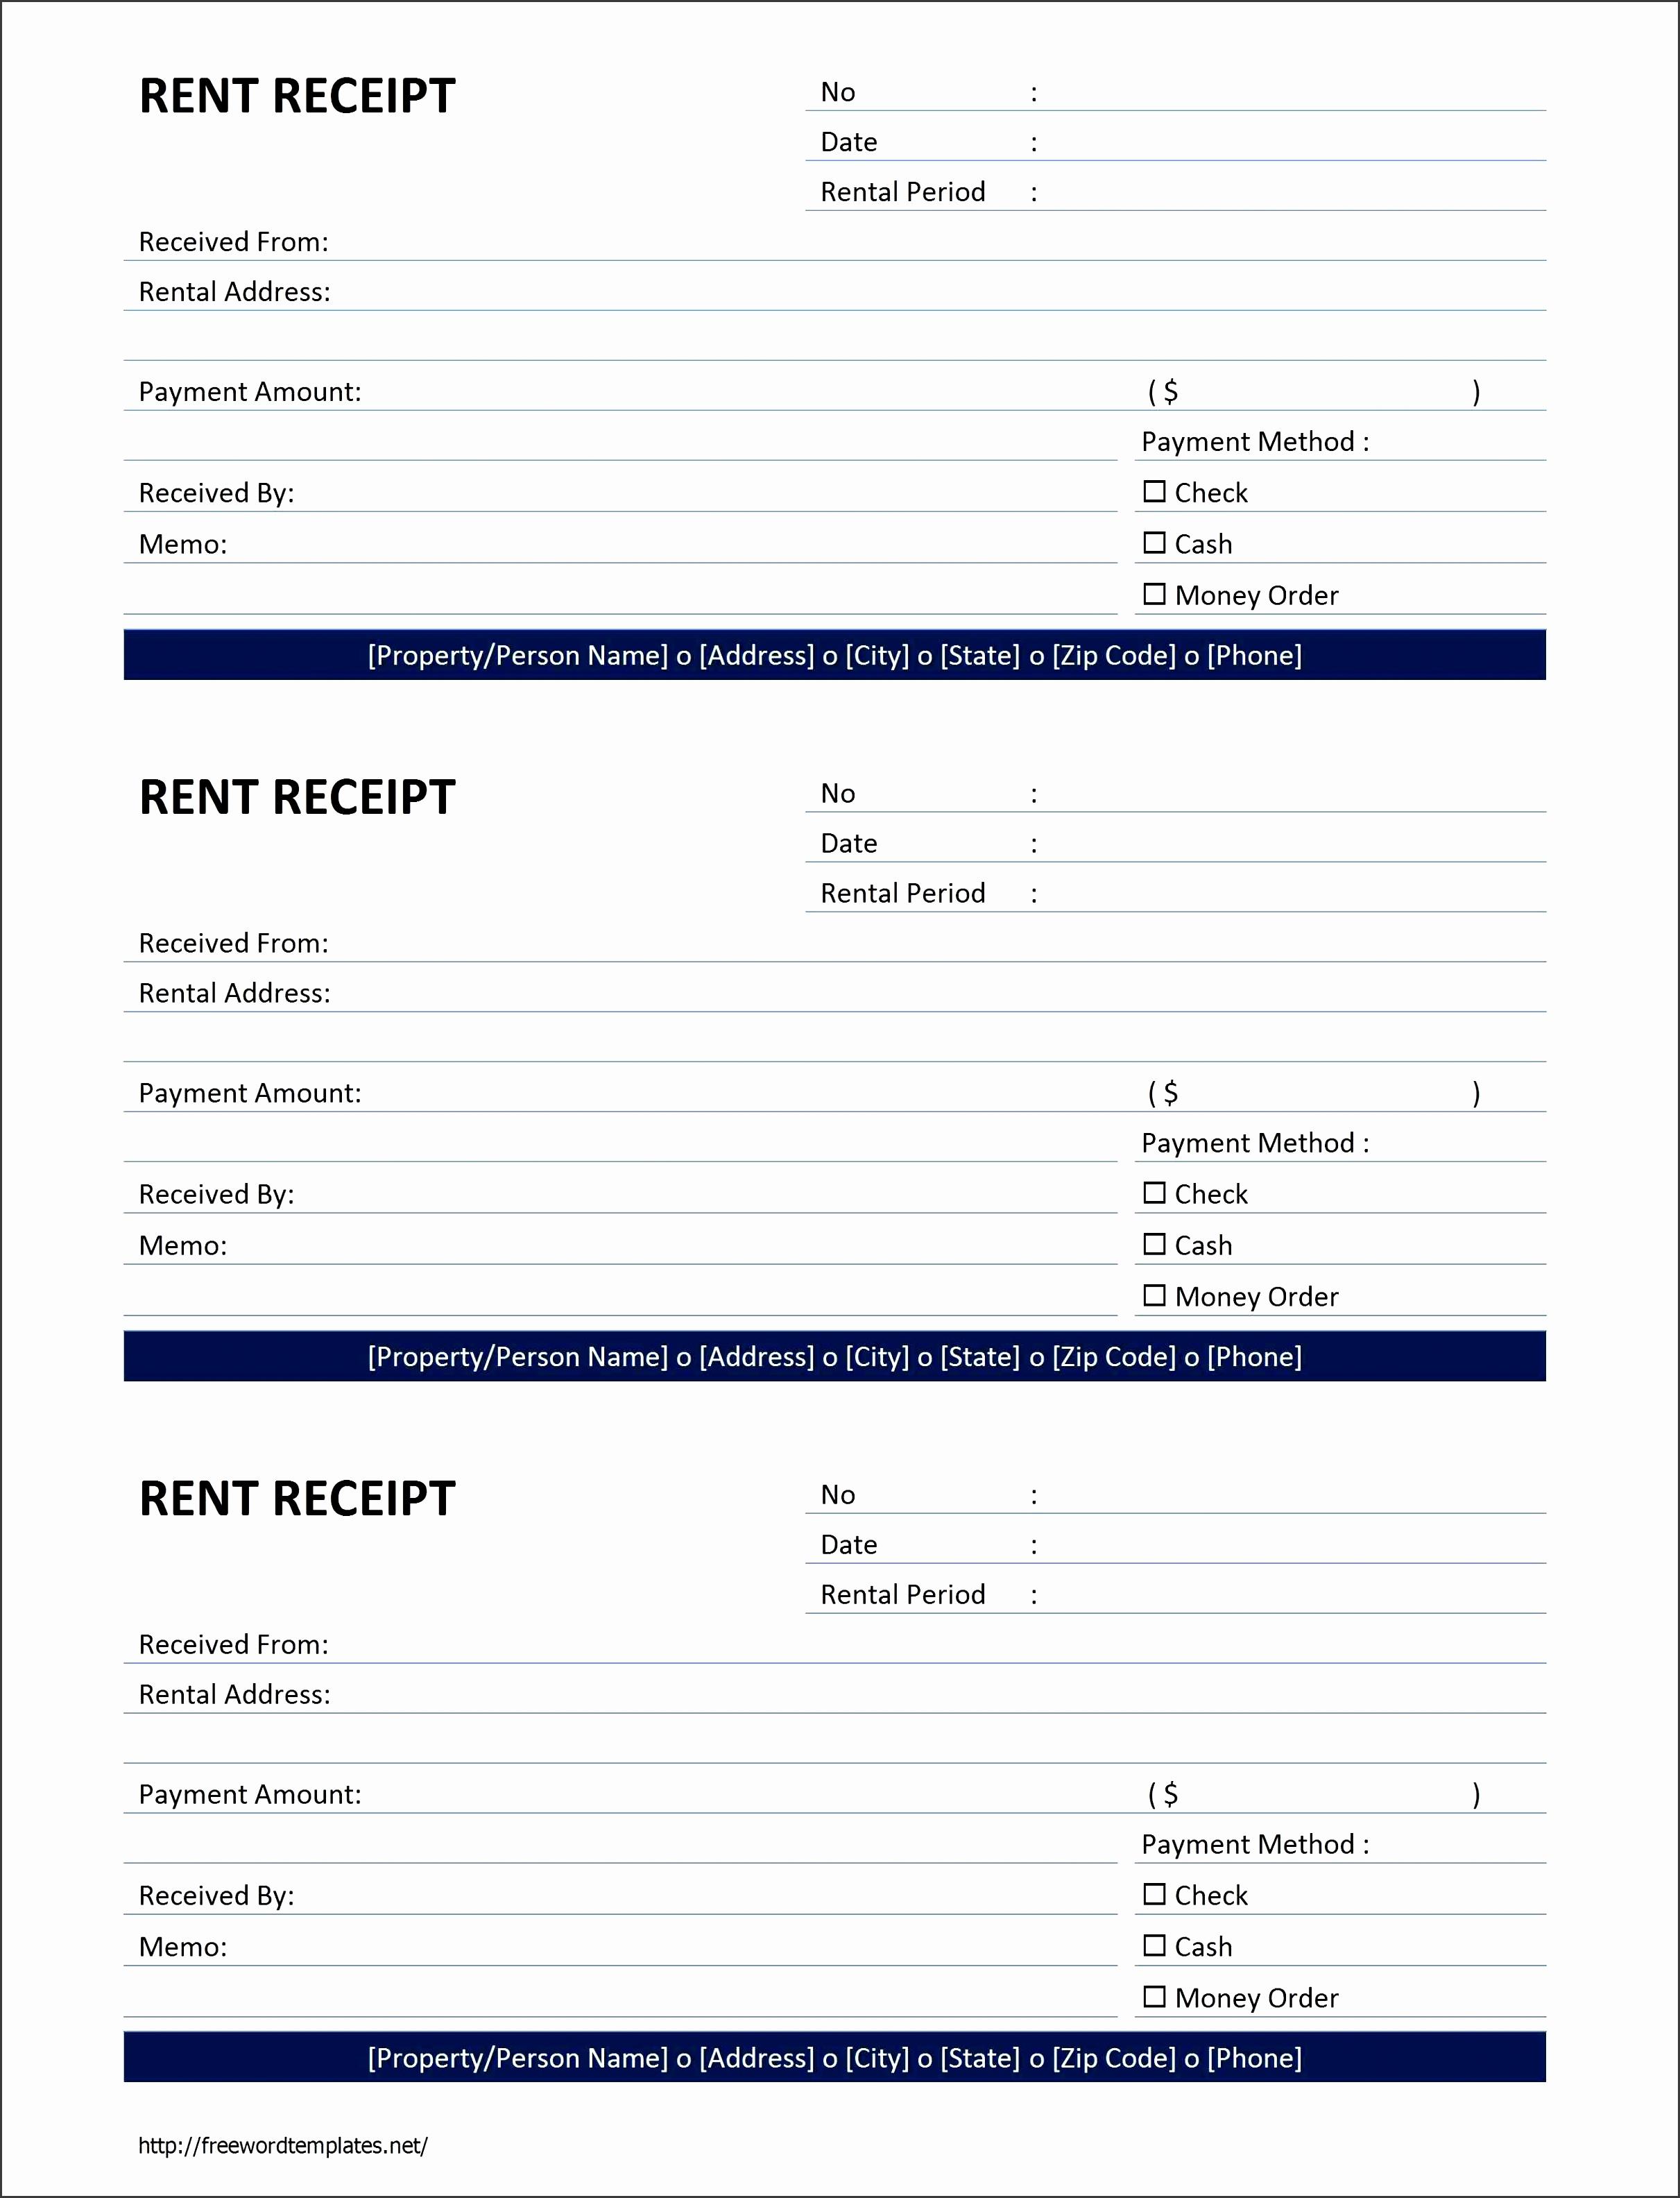 rent receipt template vohrftq7